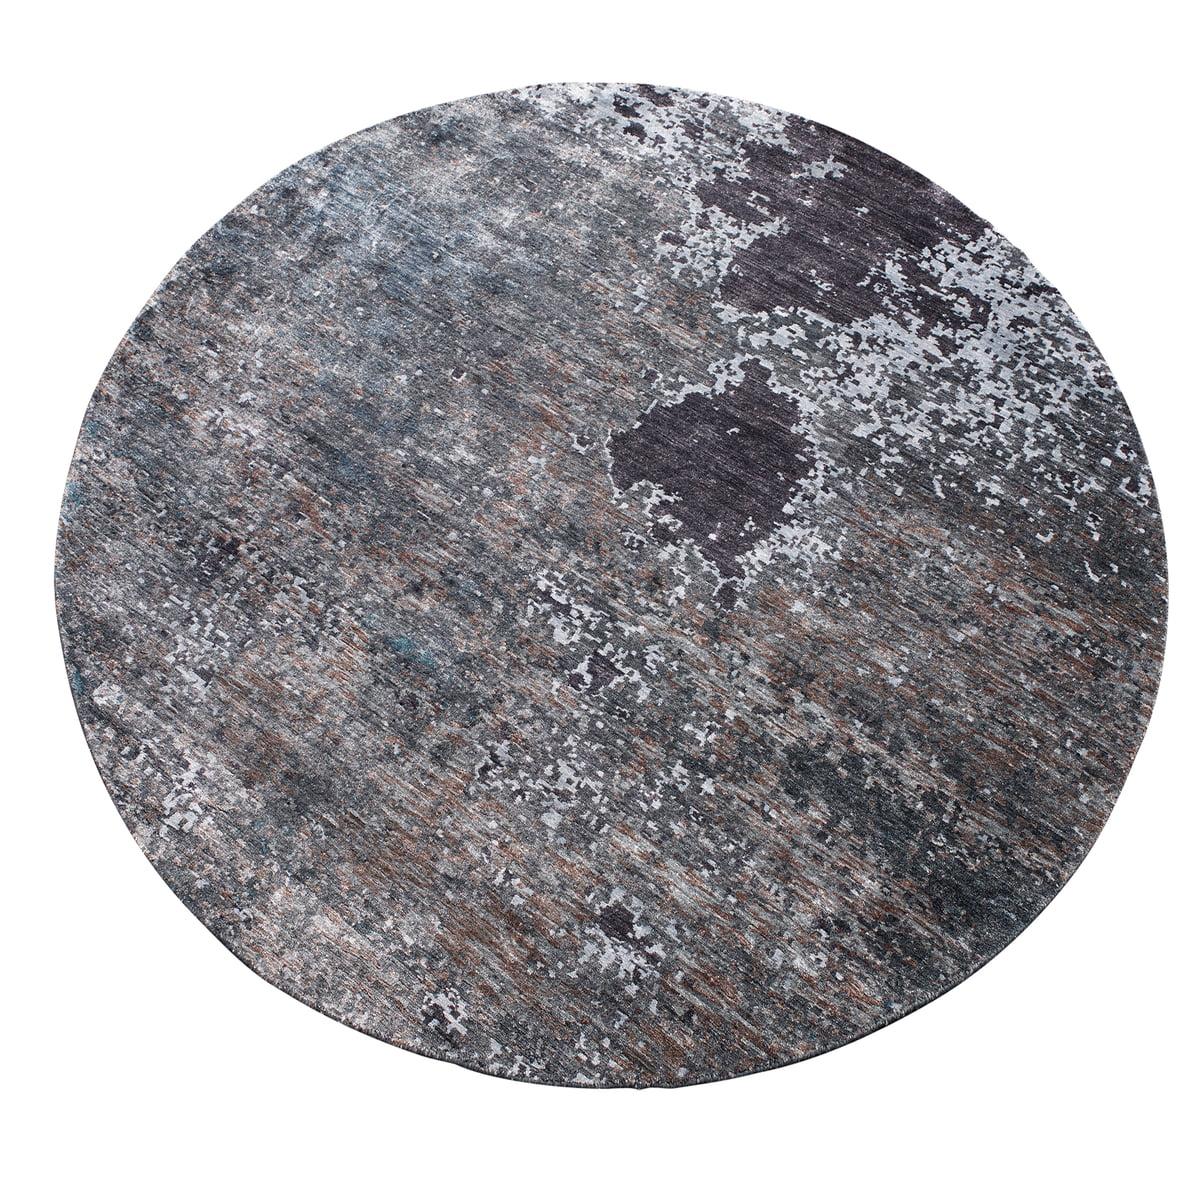 Massimo moon night teppich durchmesser 200 cm frei